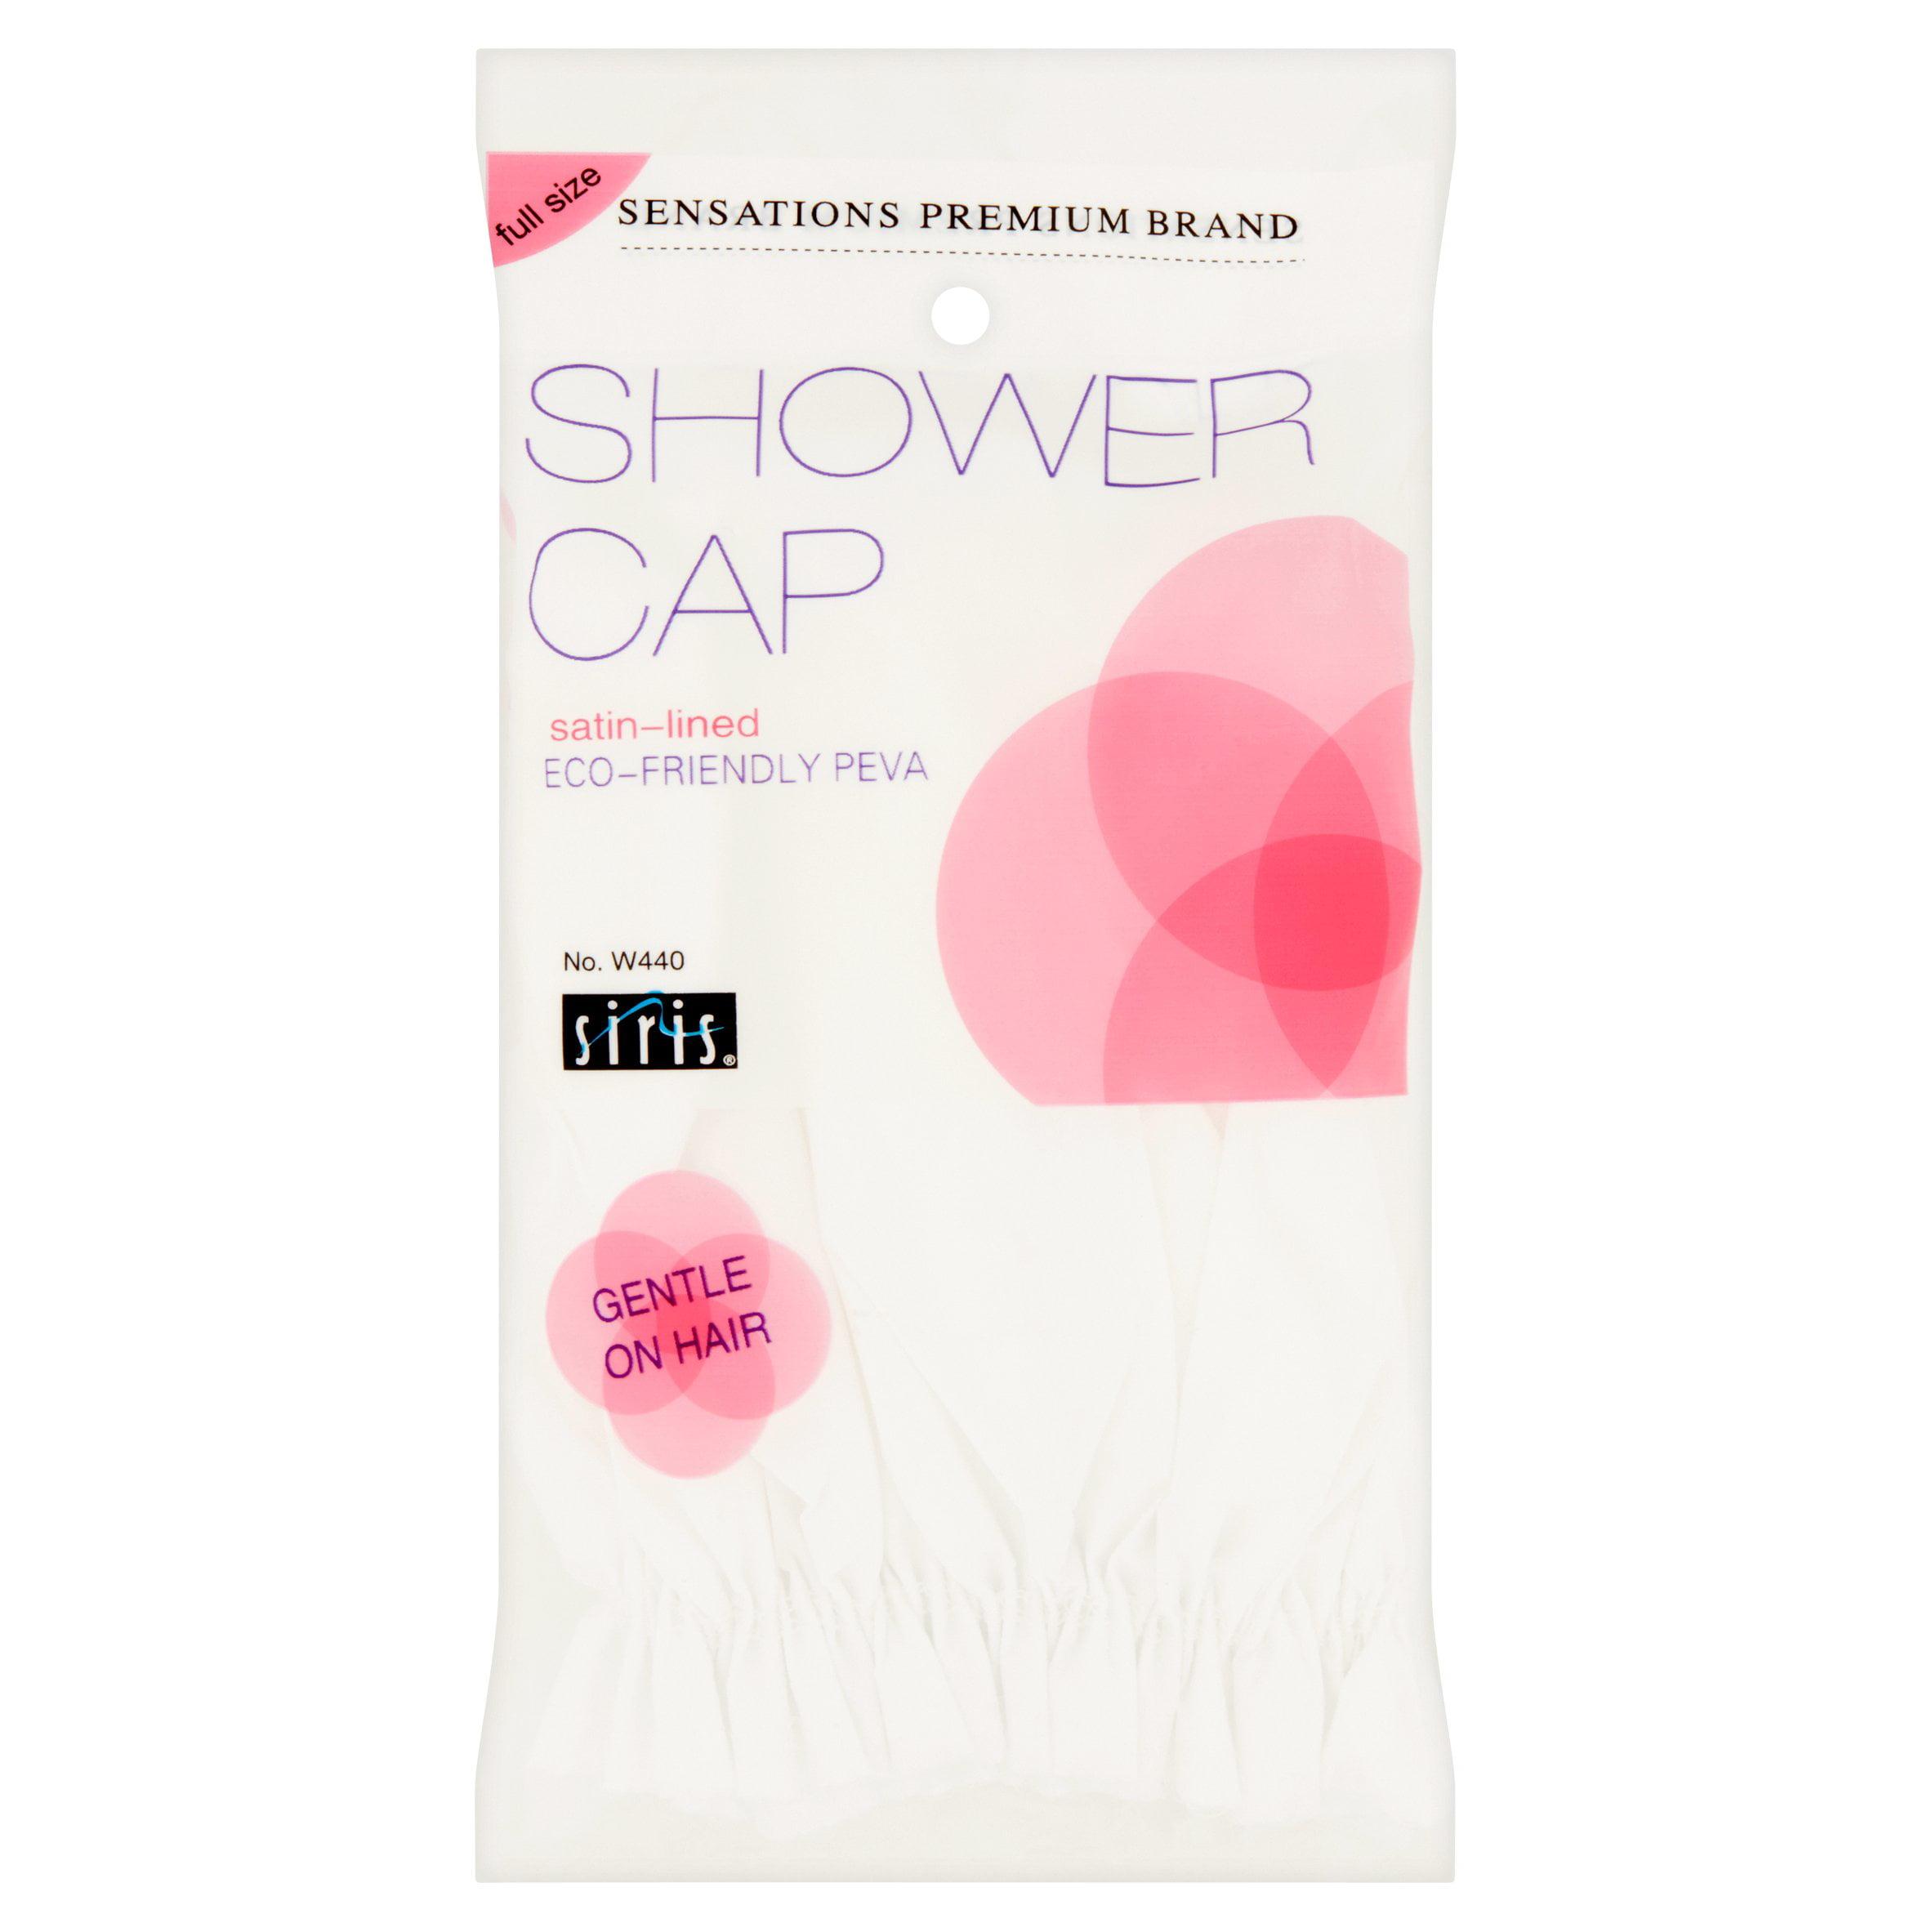 Siris Sensations Premium Brand Full Size Satin-Lined Shower Cap W440